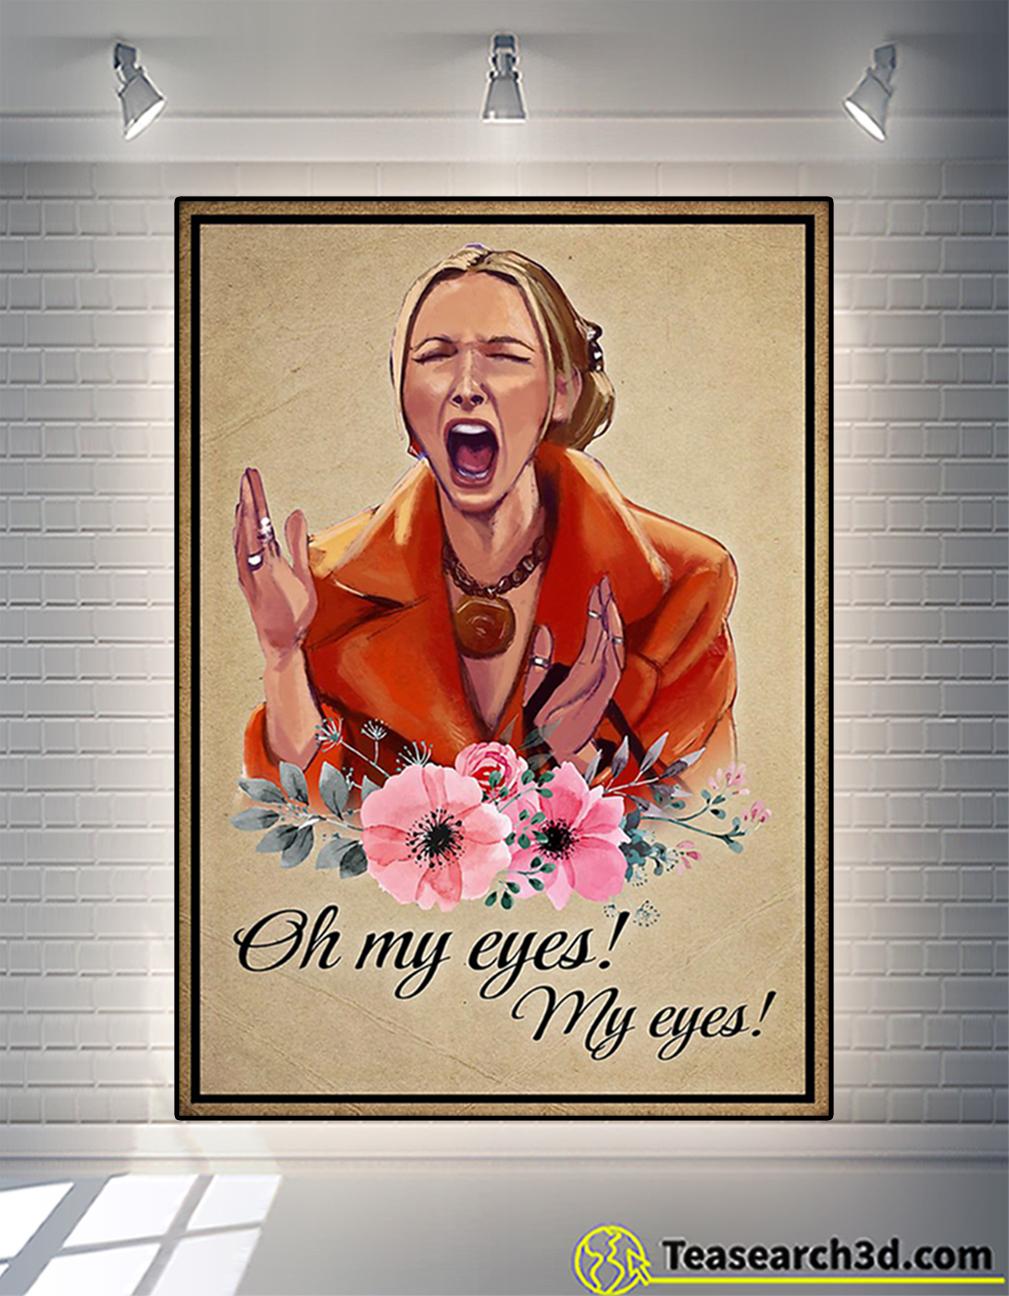 Phoebe buffay oh my eyes poster